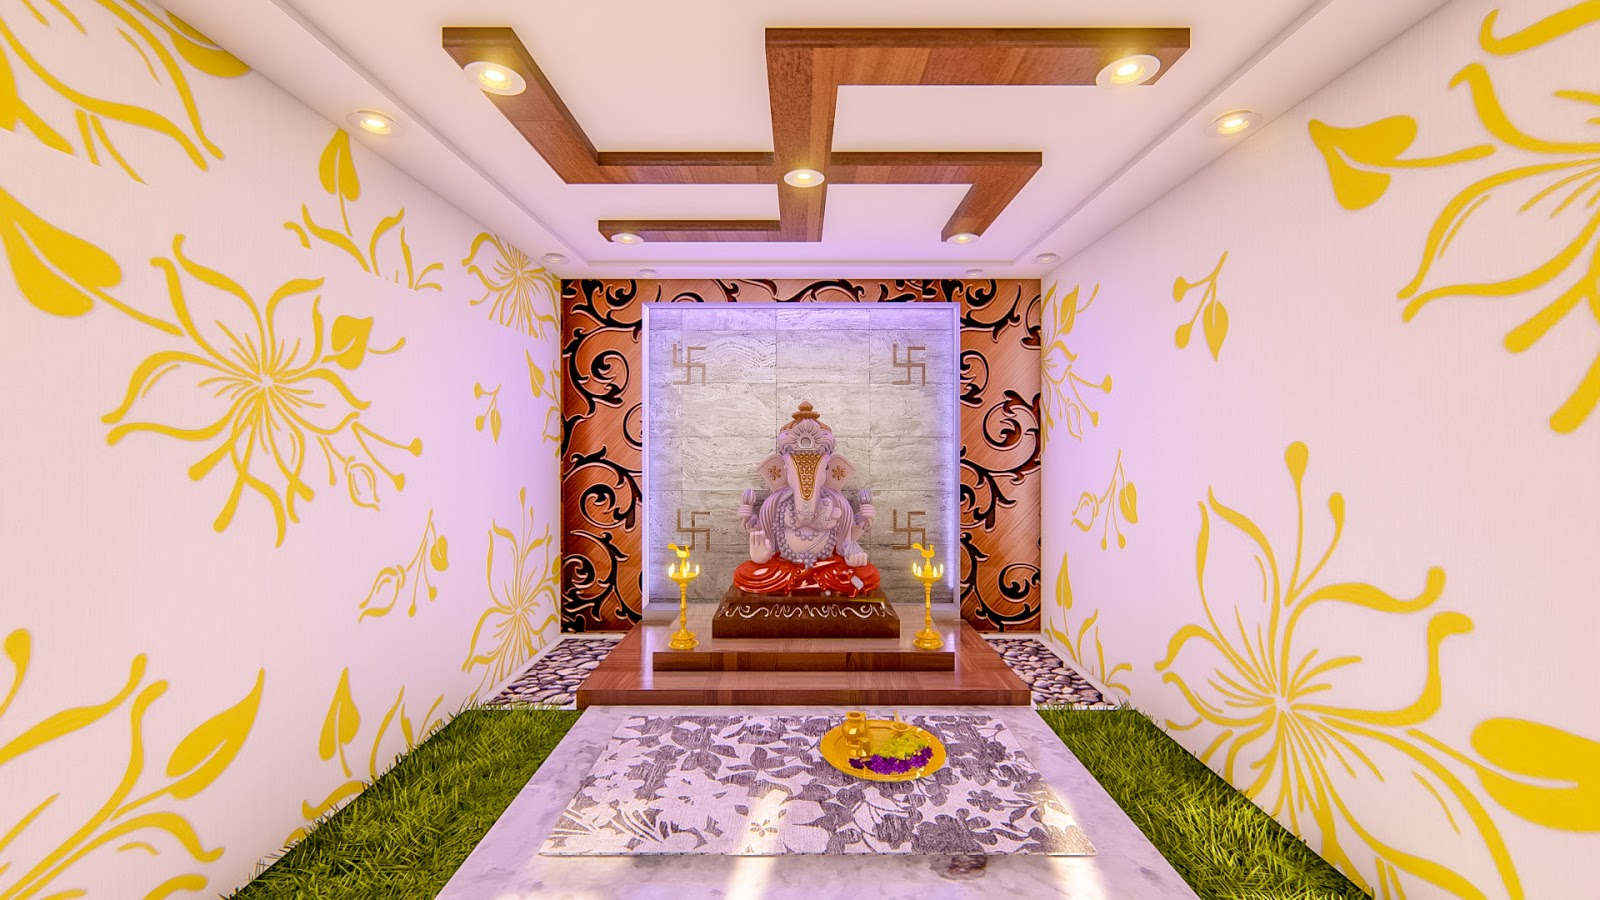 S3 Designs9 Pooja Room Designs